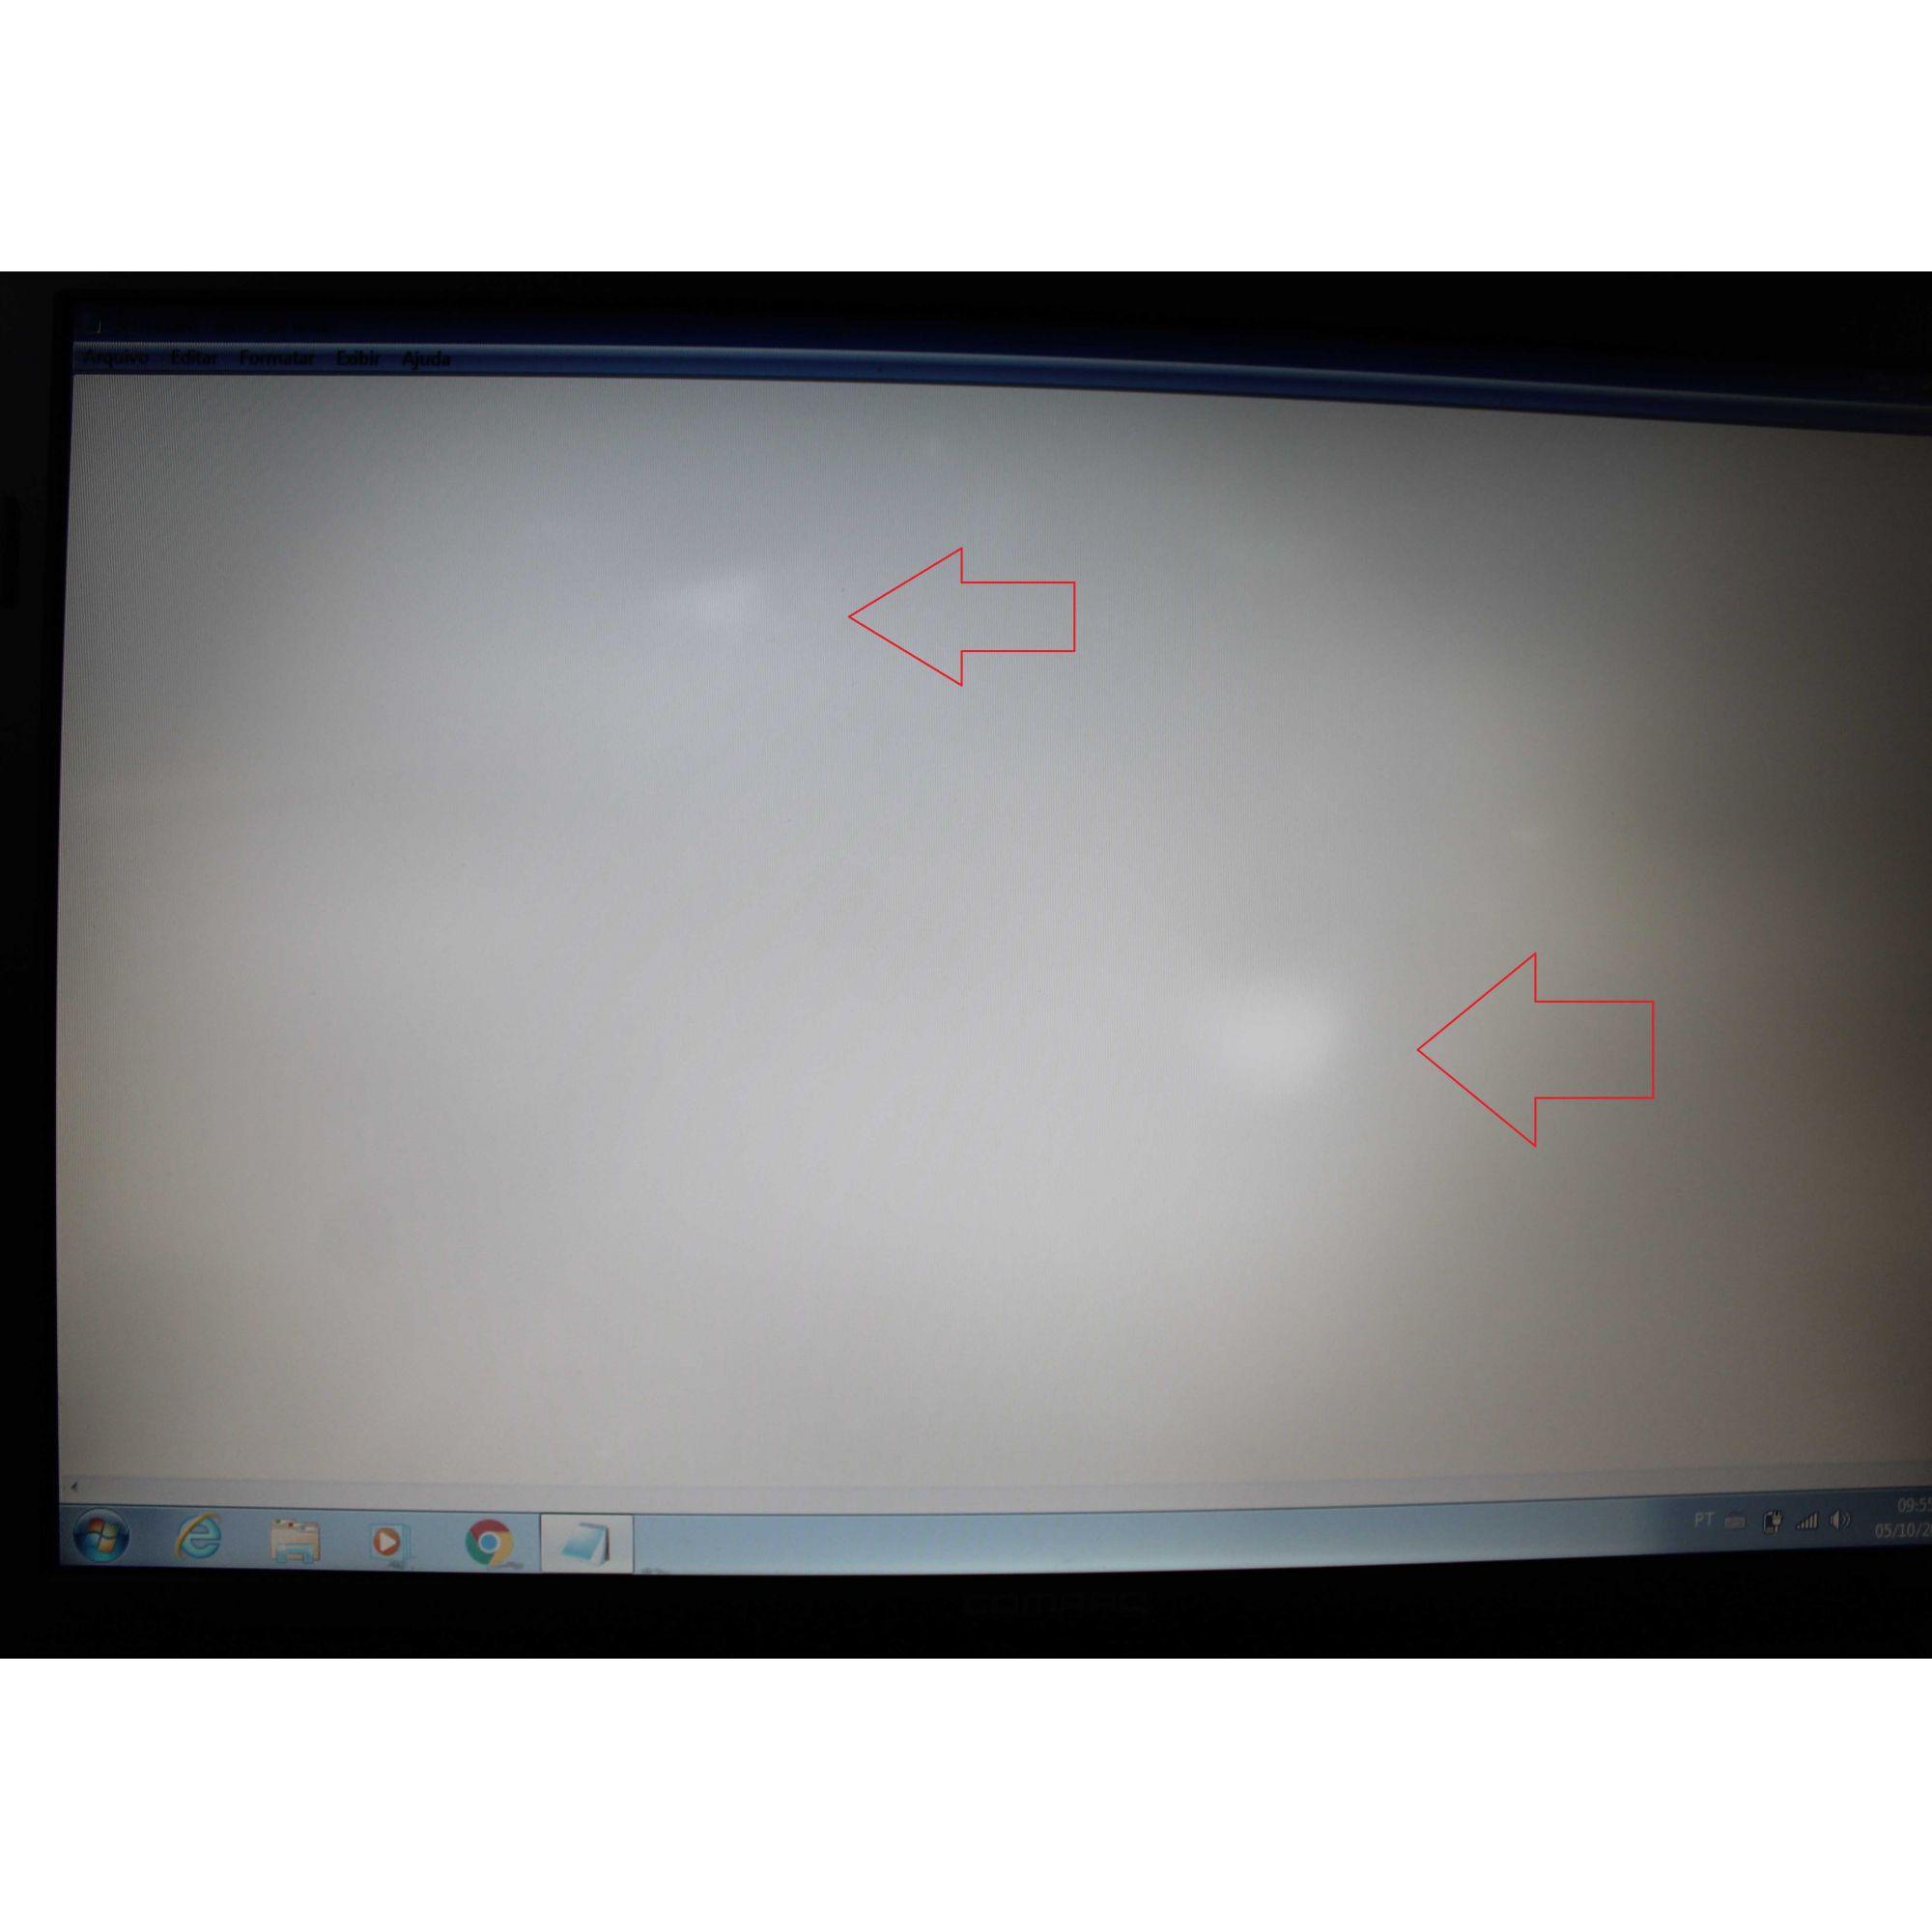 "Notebook Compaq Presario CQ40-712BR 14.1"" Pentium Dual Core 2.10GHz 2GB HD-320GB"